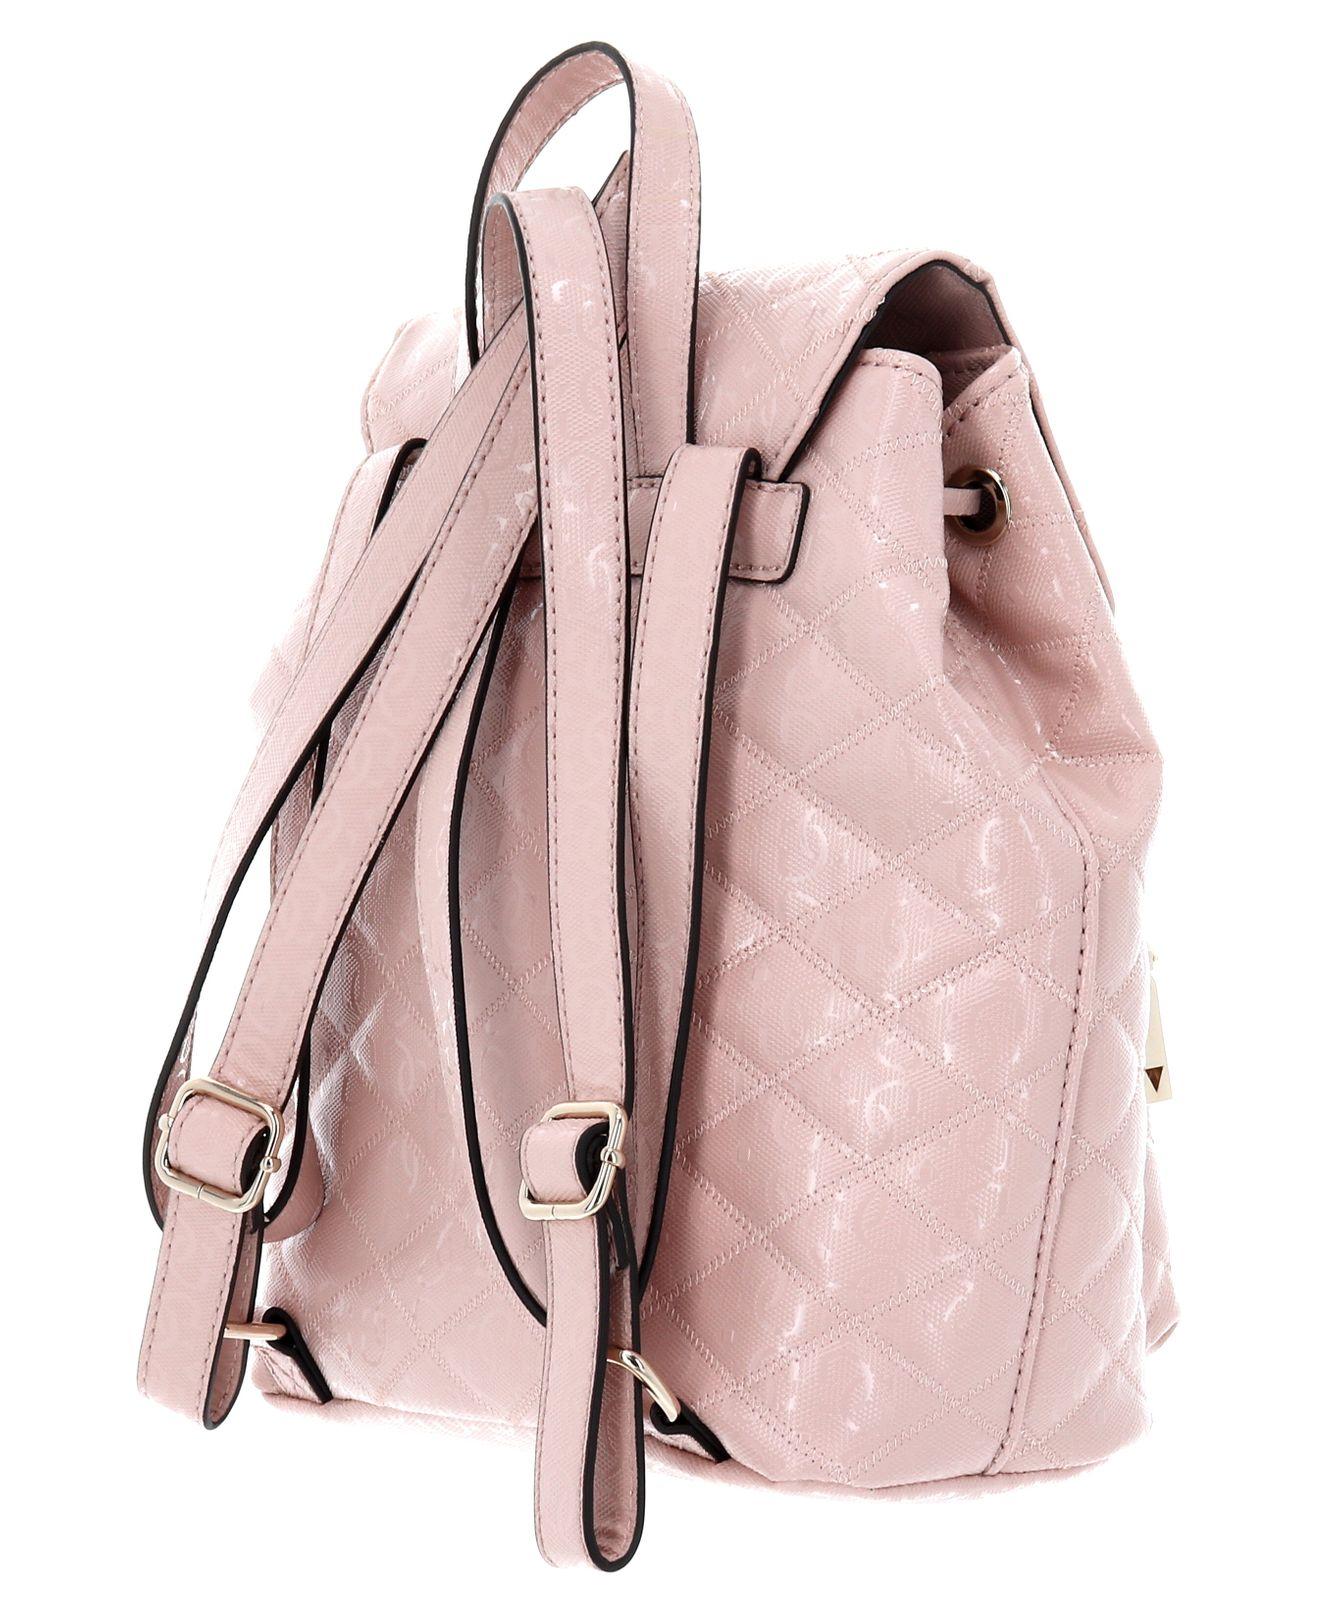 Backpacks Astrid Backpack Blush Backpacks for ladies